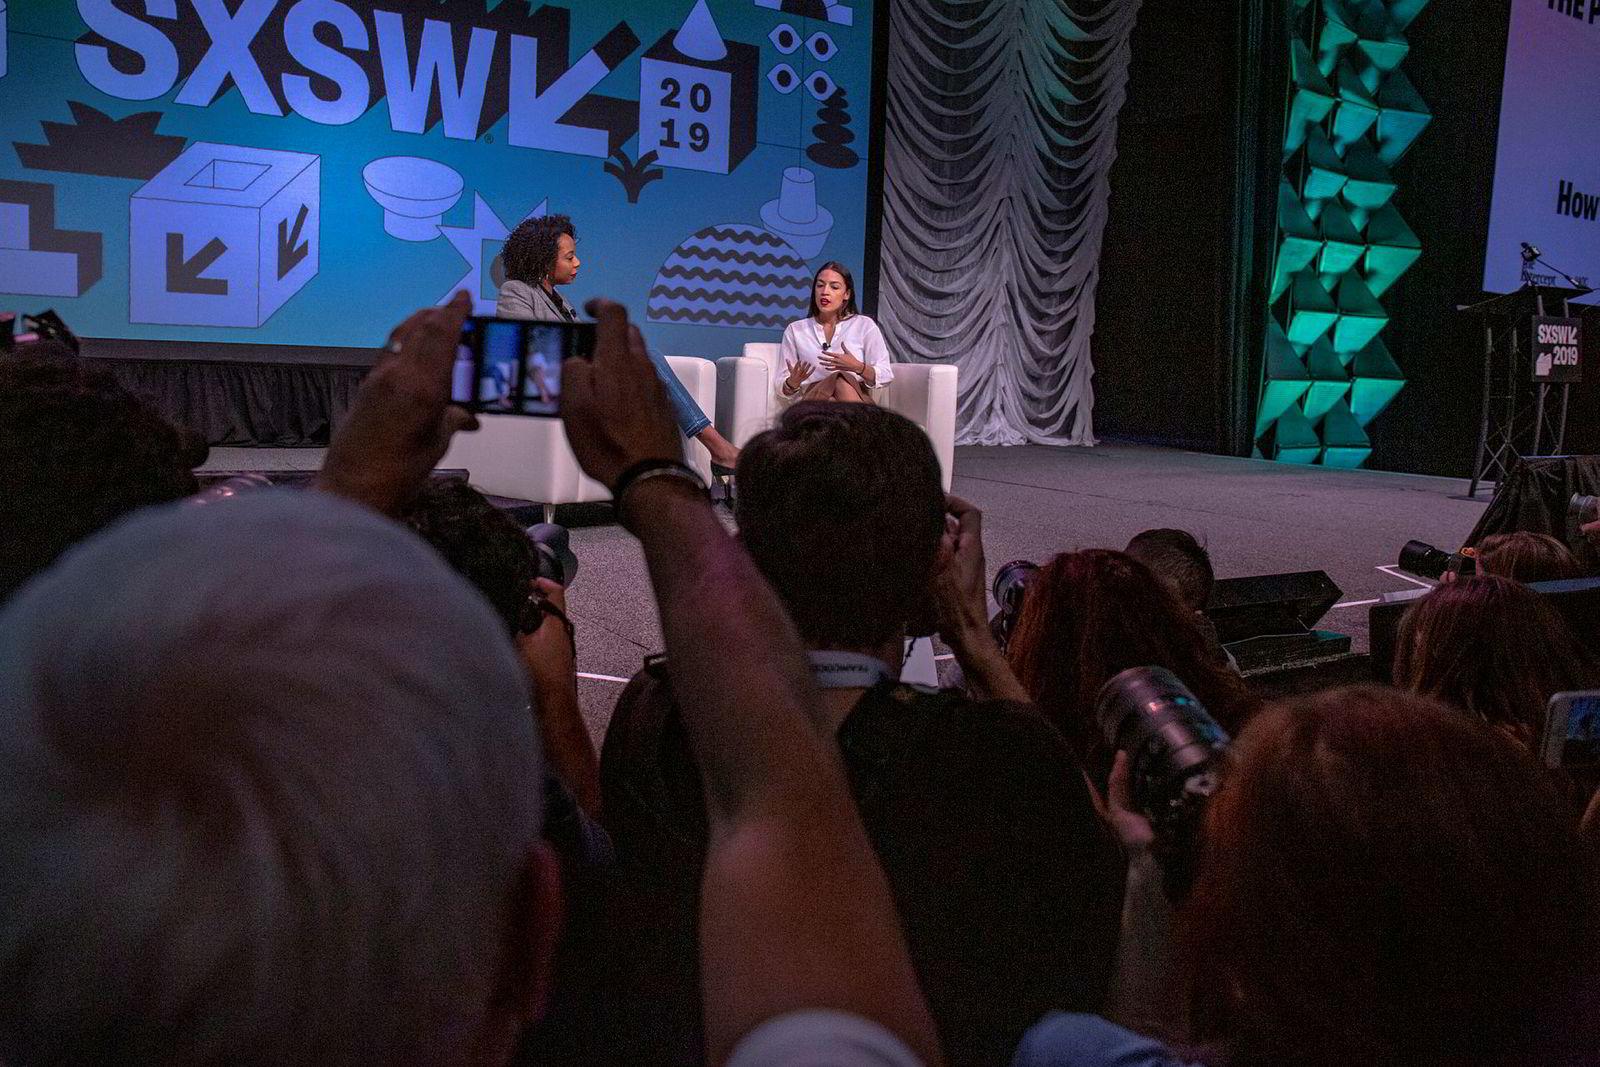 Alexandria Ocasio-Cortez ble intervjuet på scenen i Austin av kommentatoren Briahna Gray i magasinet The Intercept.